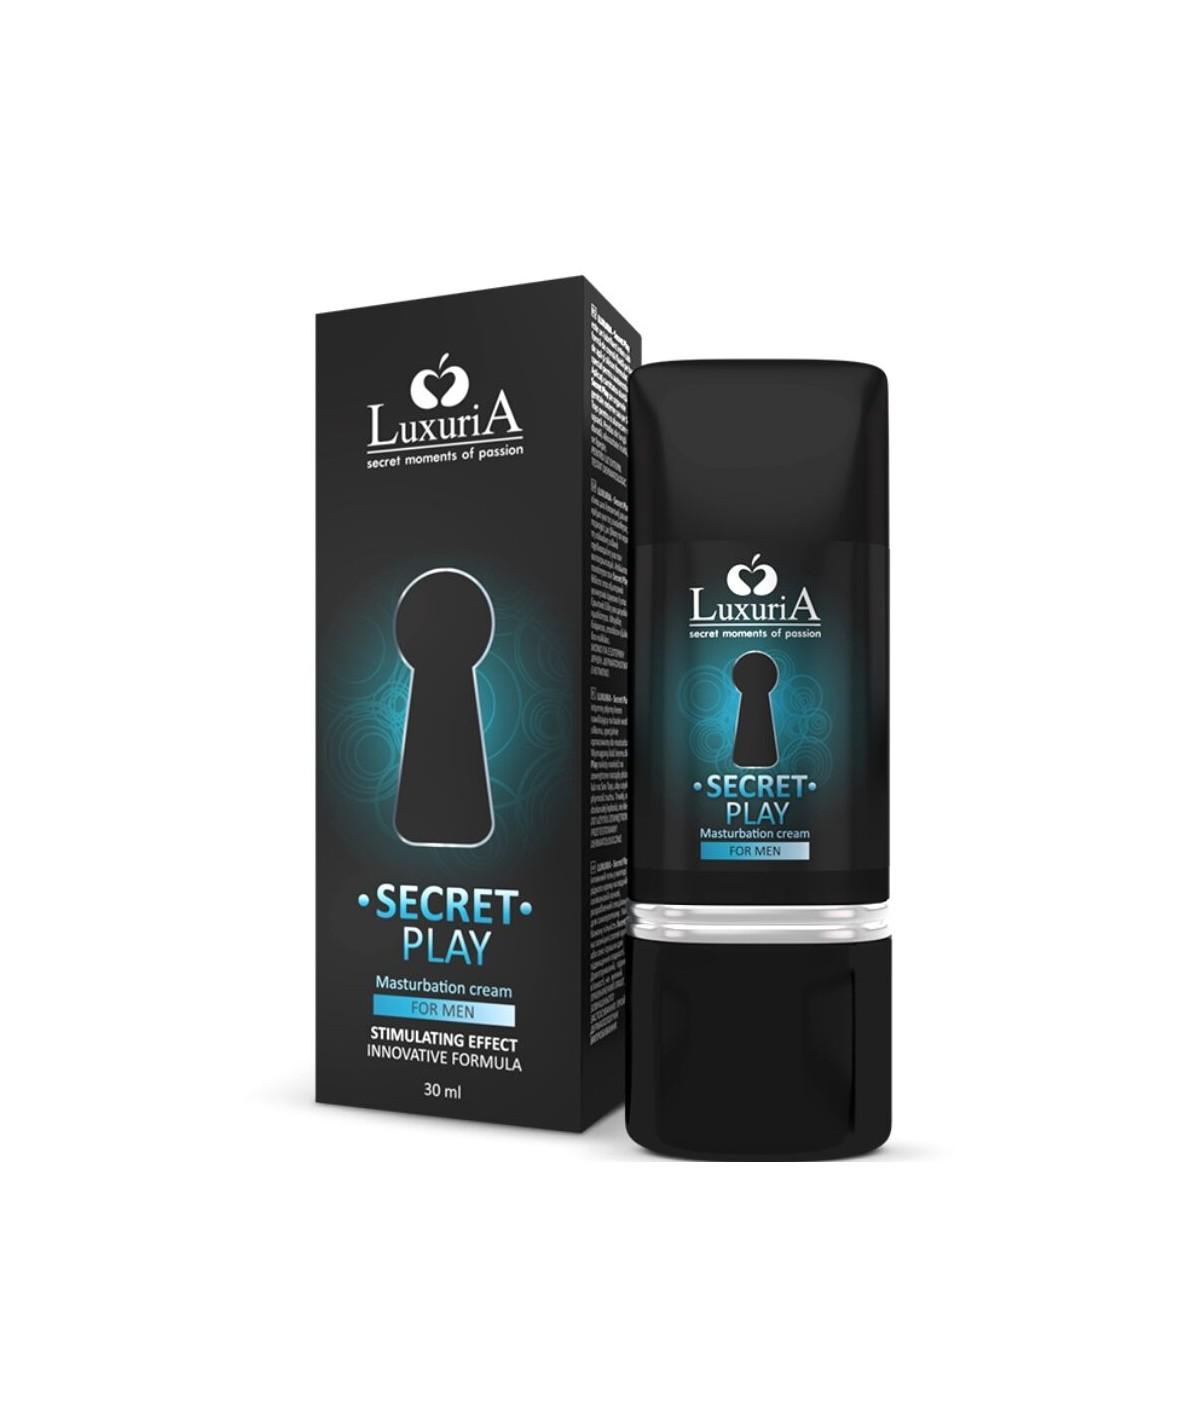 Secret Spiel